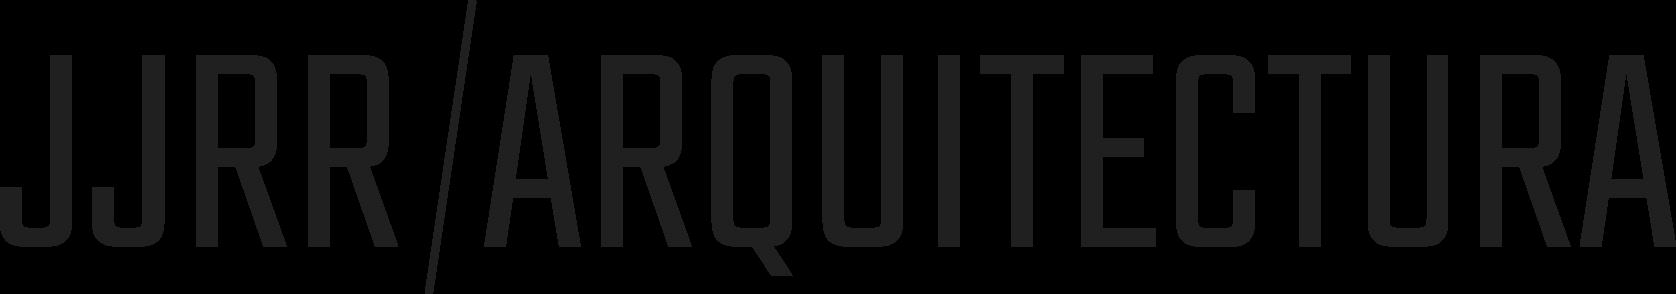 JJRR / Arquitectura logo